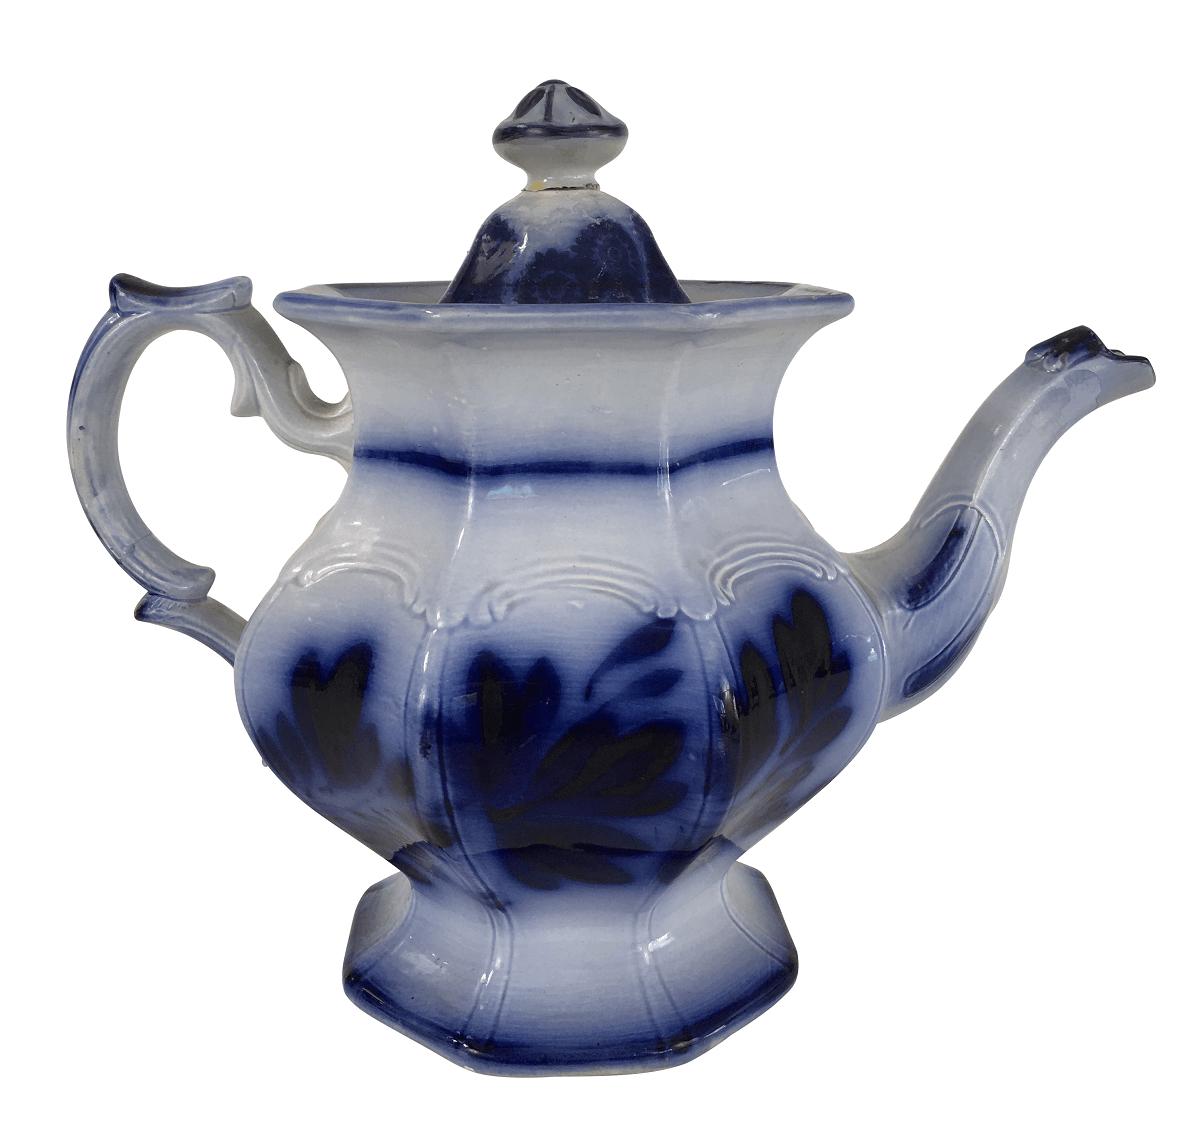 Grande Bule De Cha Porcelana Antiga Inglesa Borrao